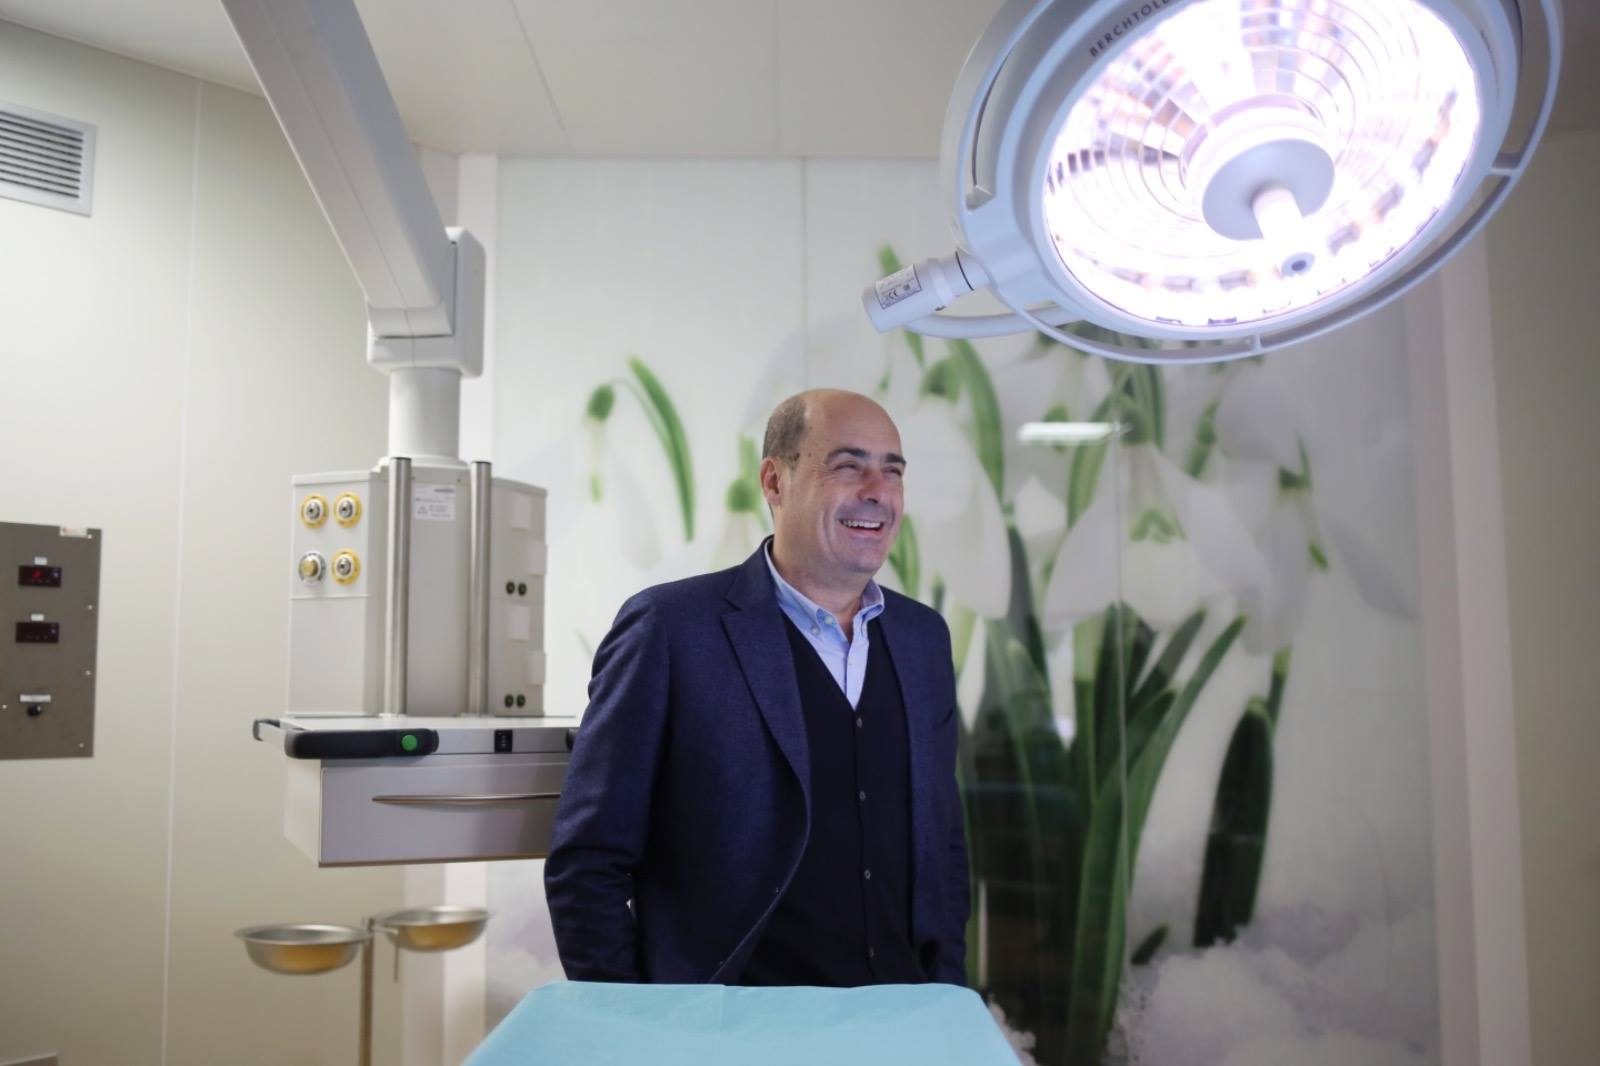 Nicola Zingaretti all'ospedale